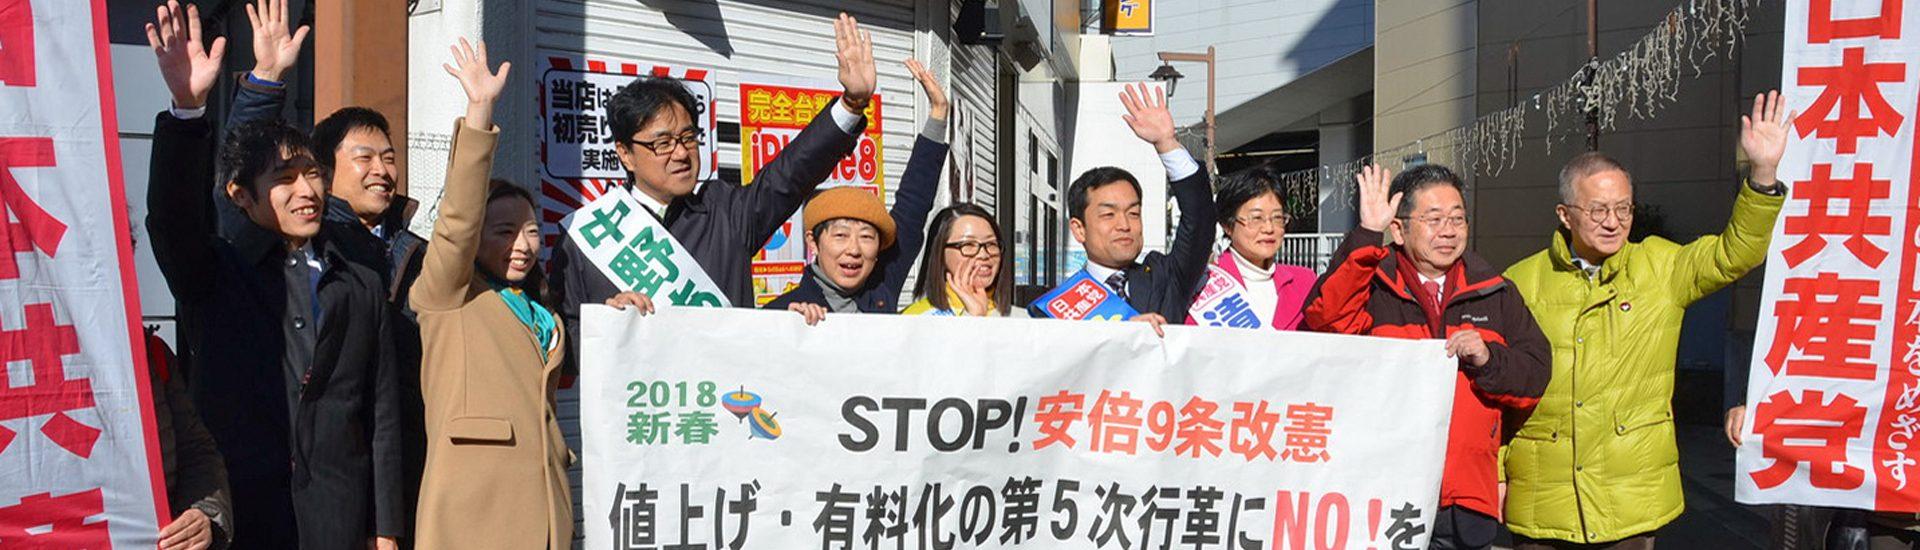 TPP撤退 農村再生を全国食健連が新春行動